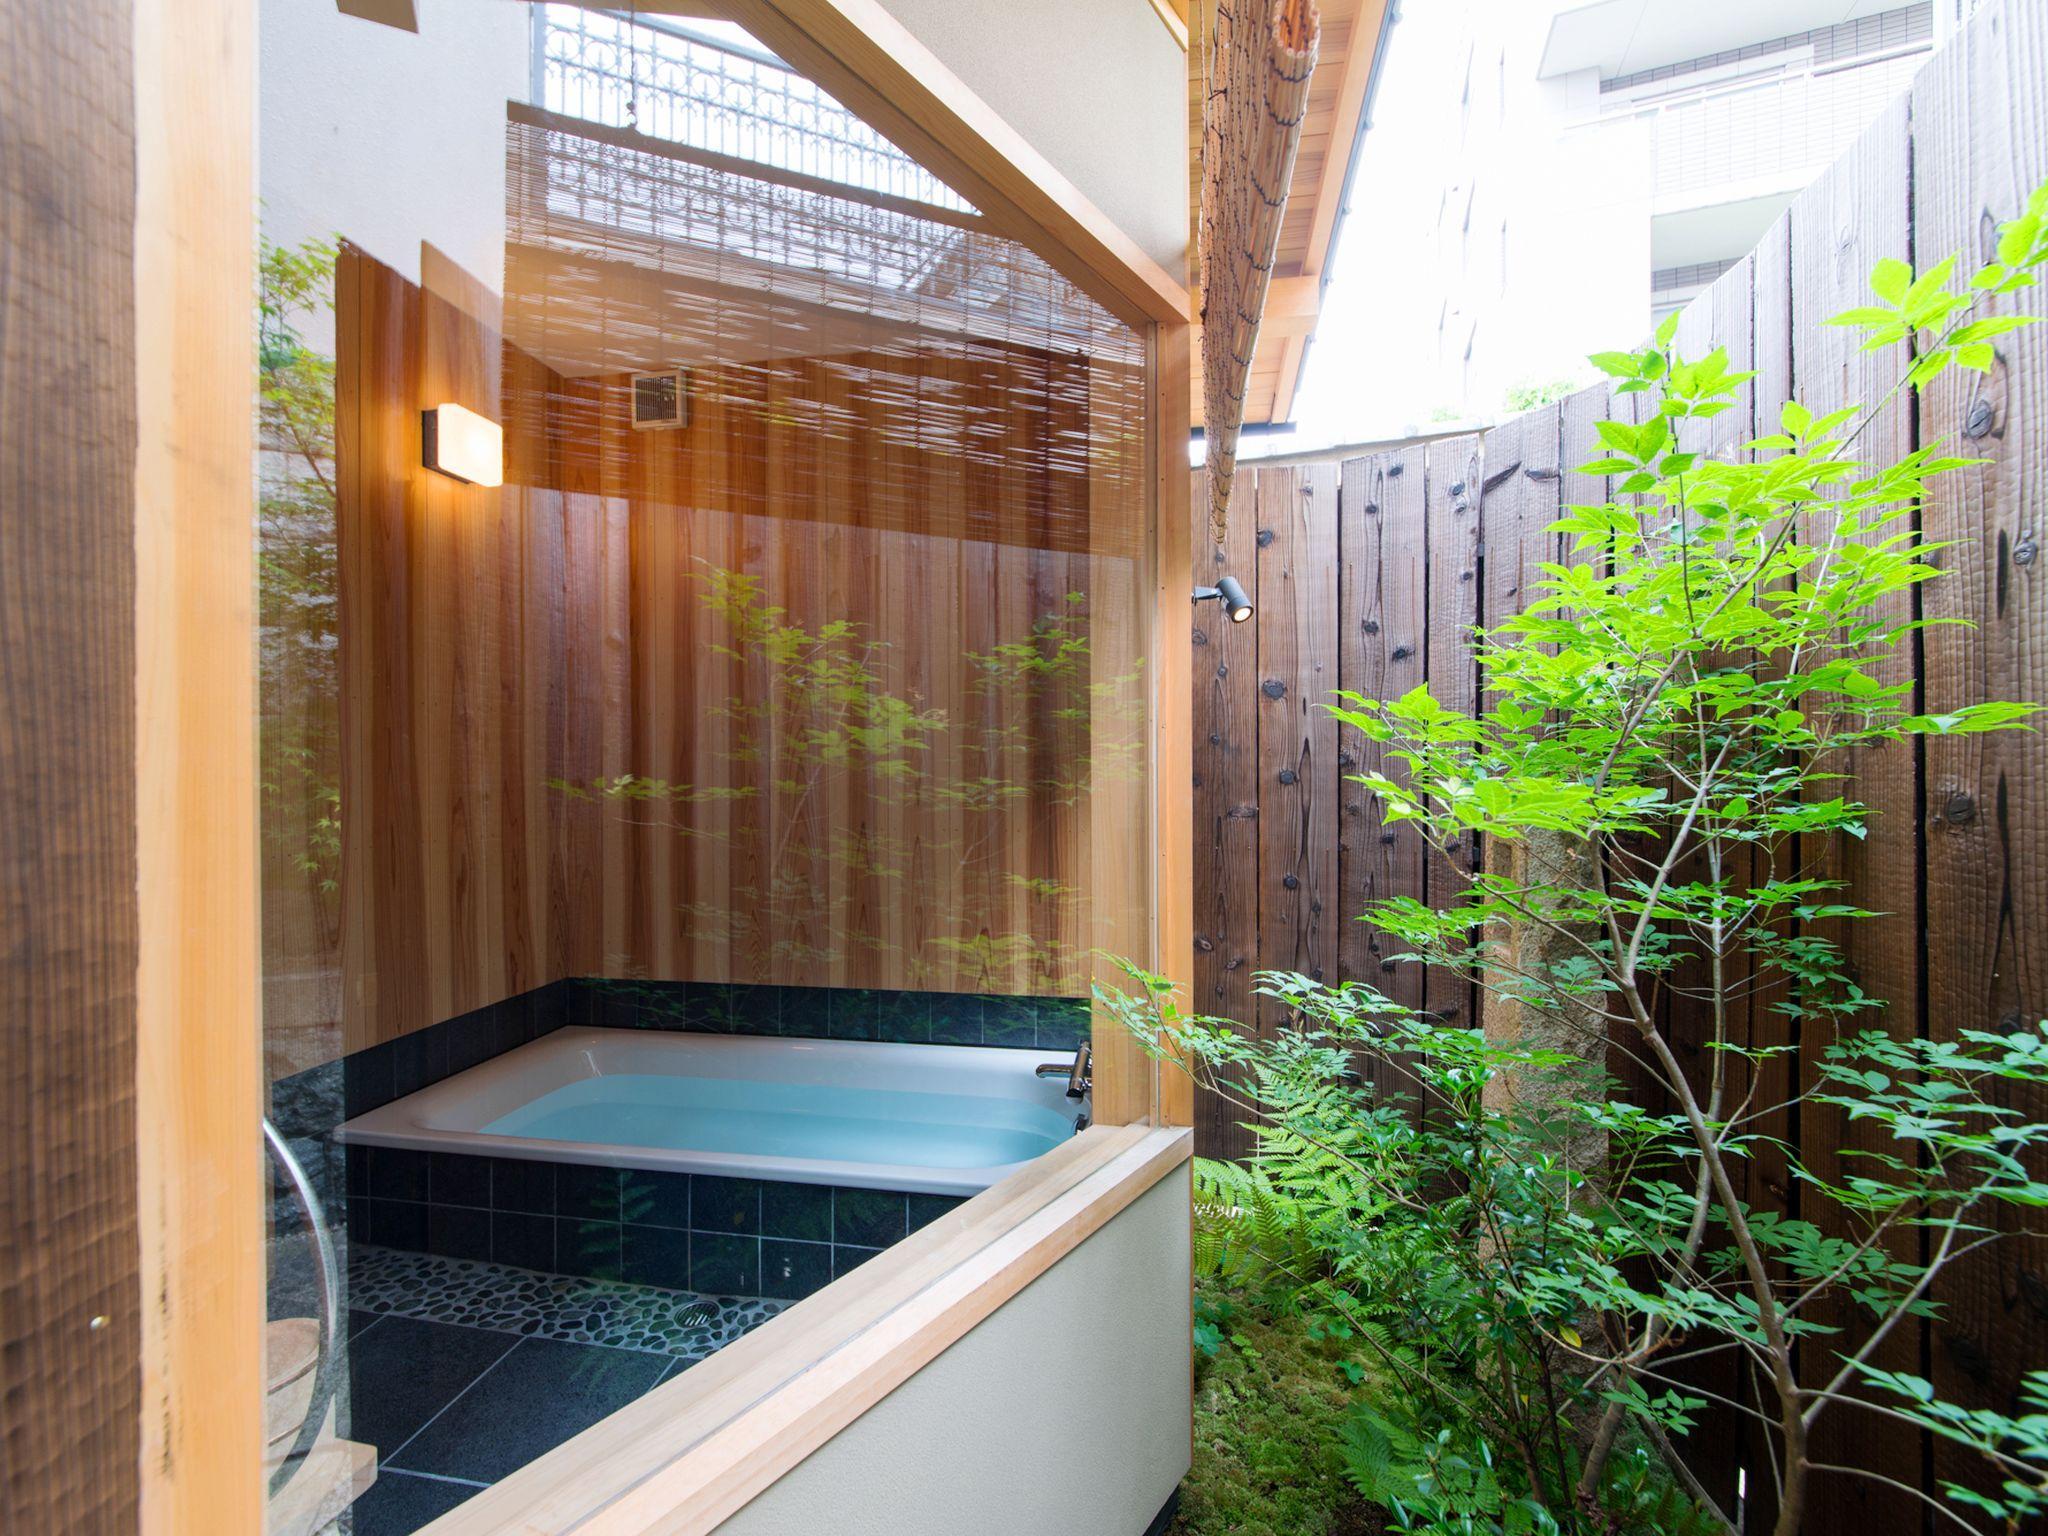 Momiji An Private And Comfortable House In Kiyomizu